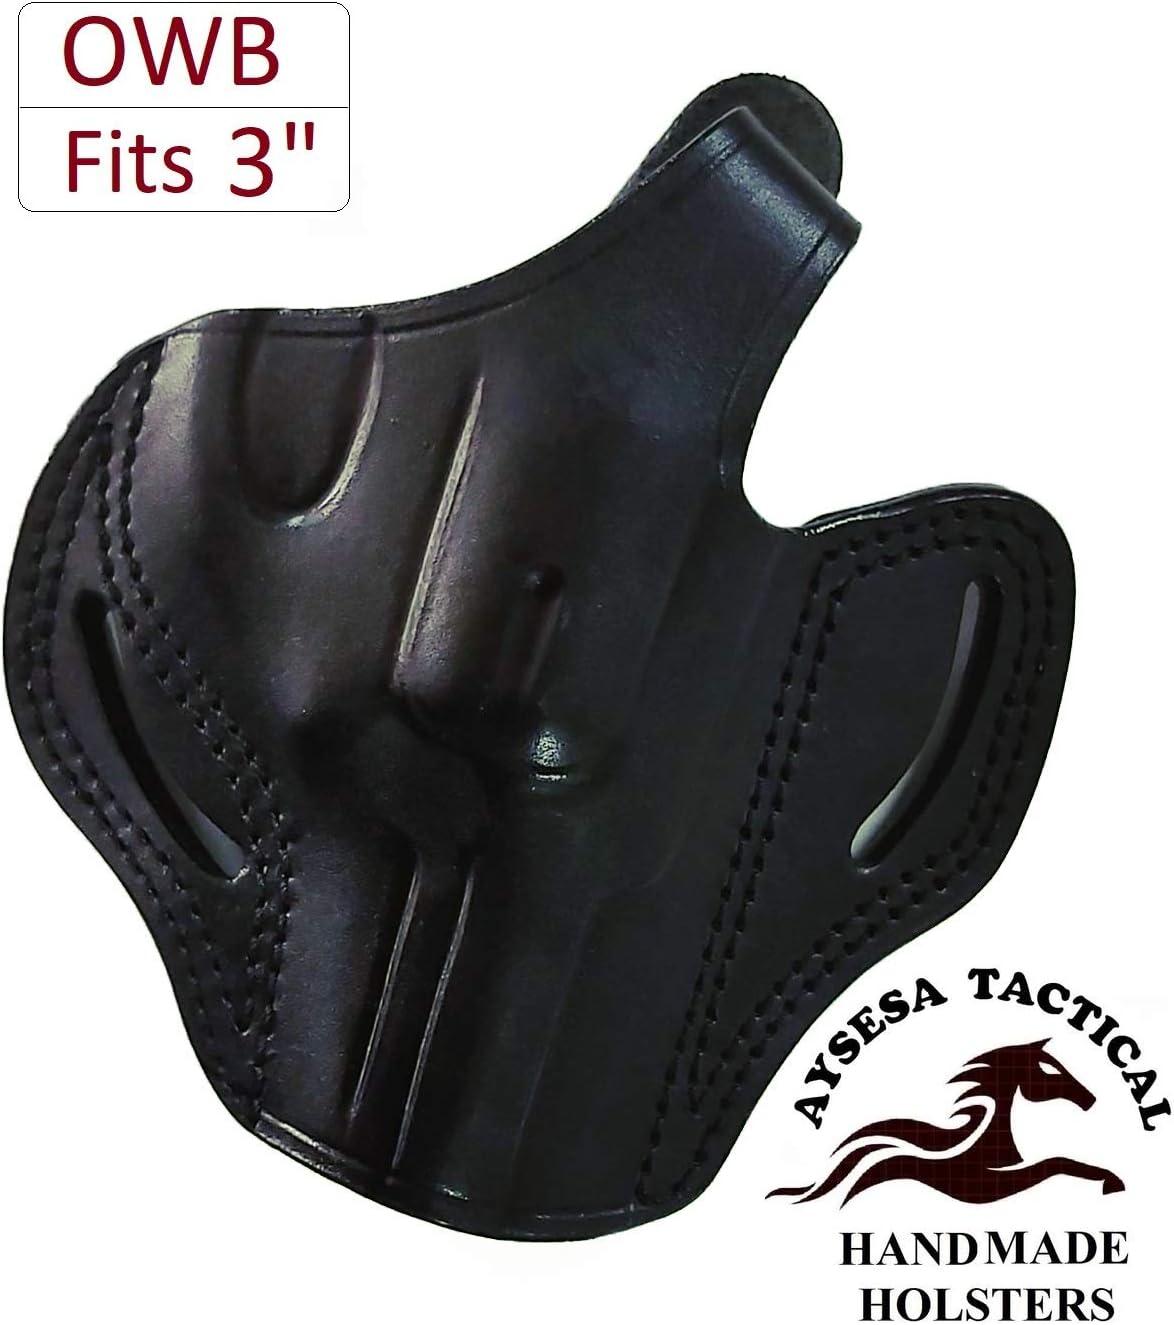 OWB Leather Revolver Gun Holster for Colt King Cobra 357 3 Inch Barrel Taurus 905 Ruger LCRX Rossi r462 Right Handed Concealed Carry Black